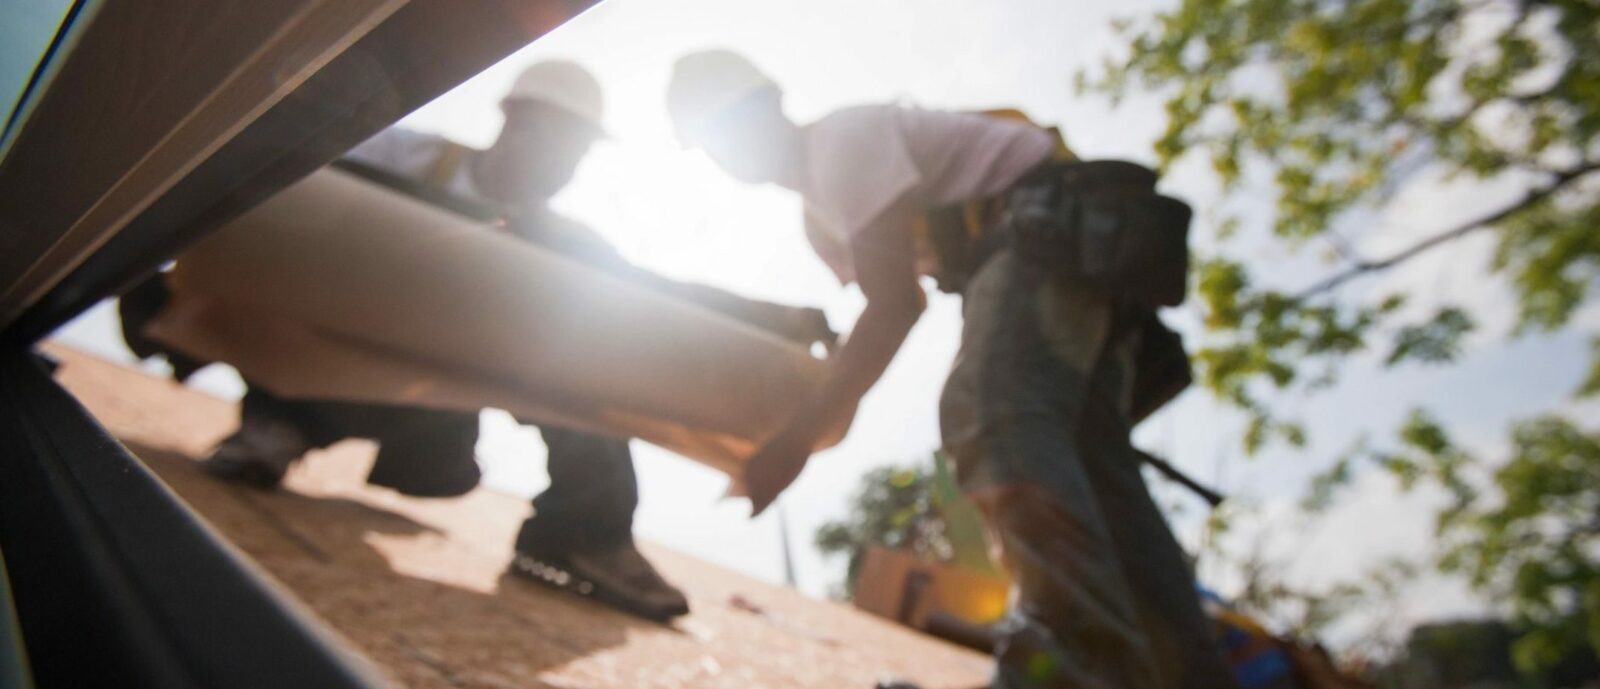 Home Roof Repair J King Deshazo Iii Inc Roofing Company